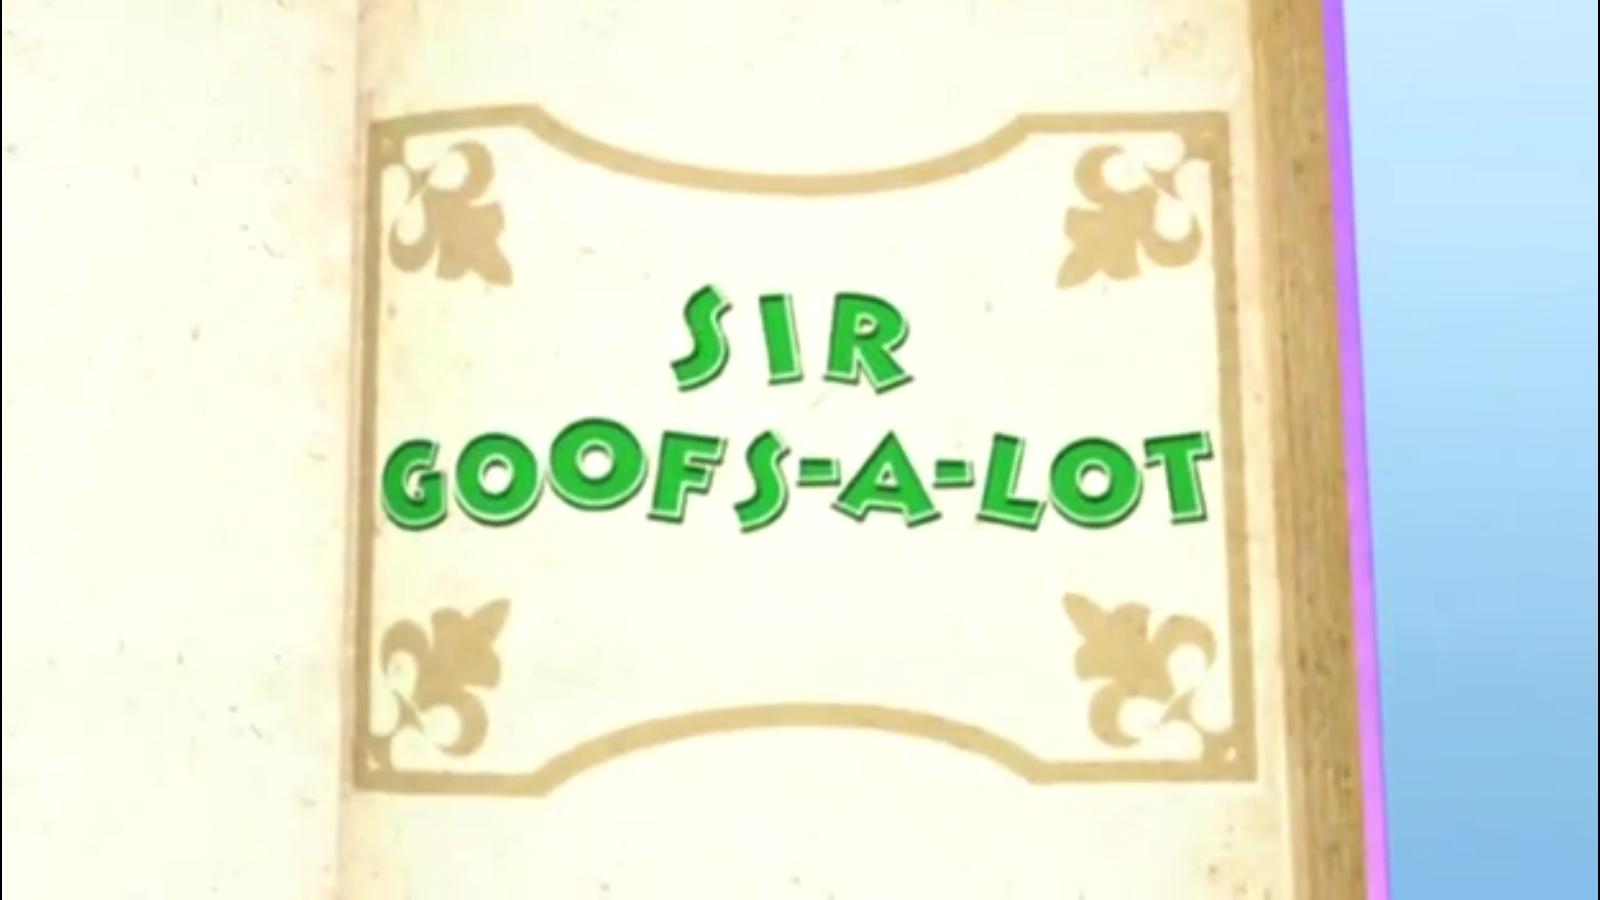 Sir Goofs-a-Lot